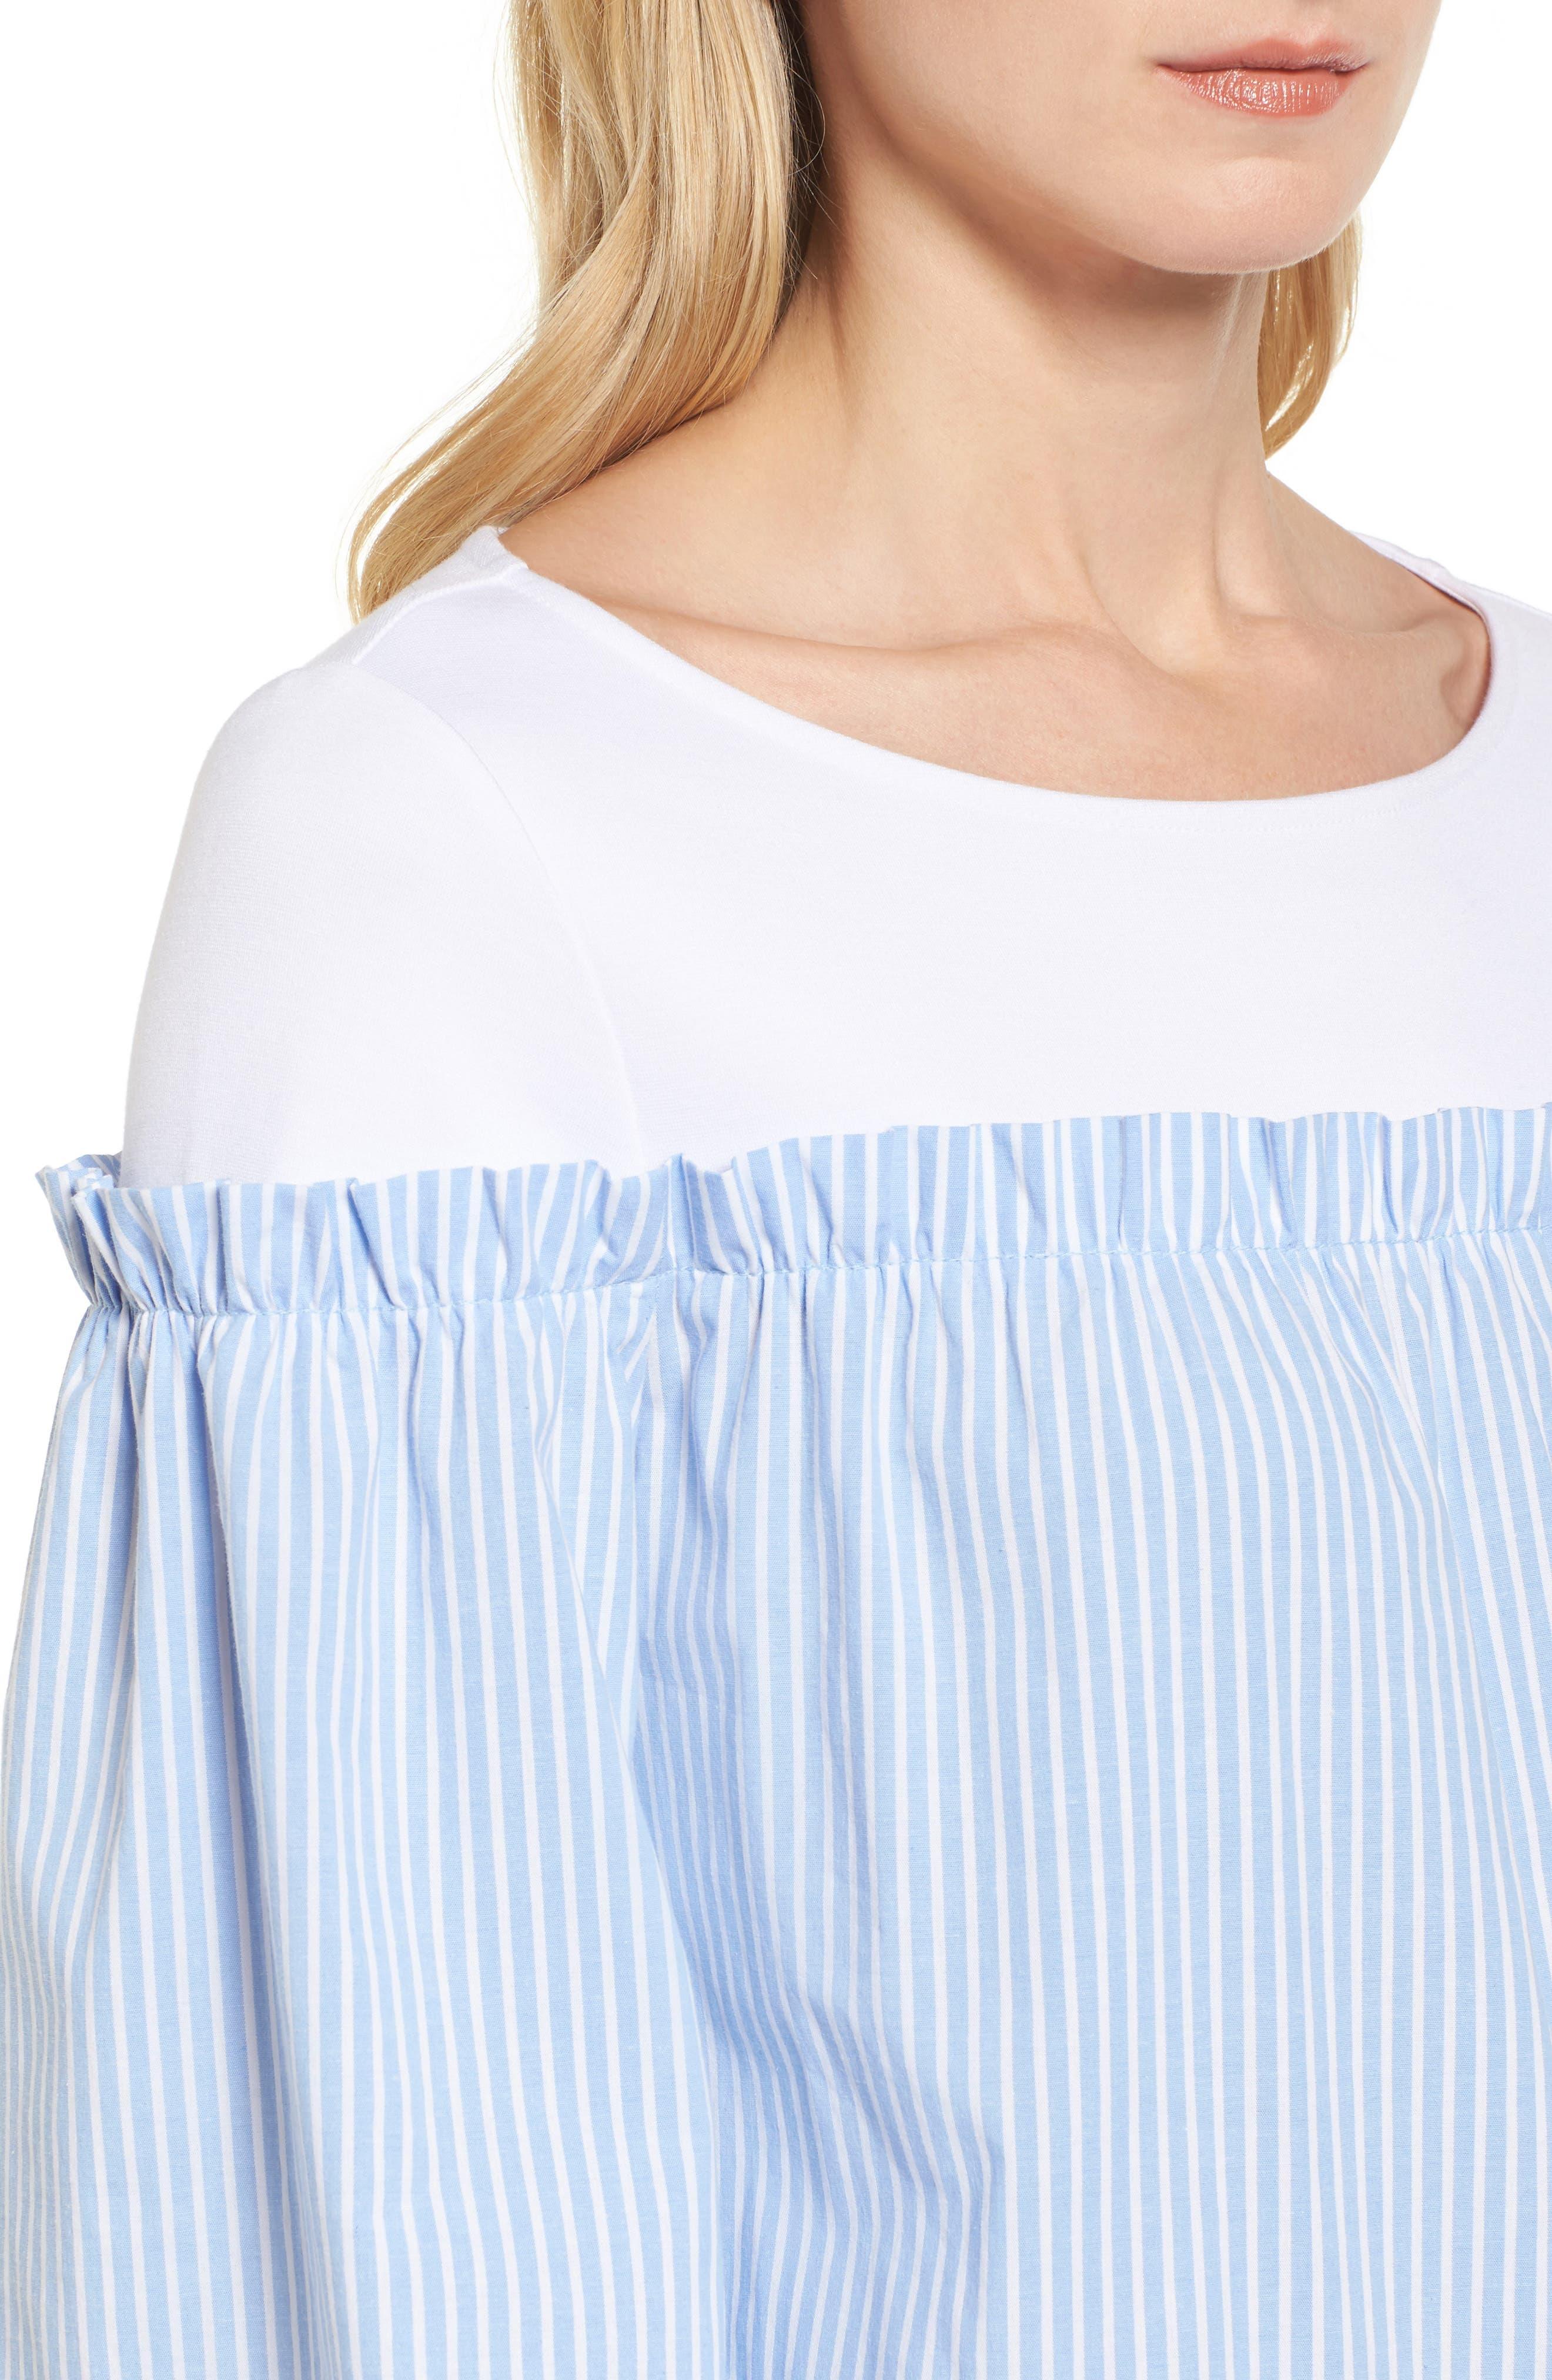 Ruffle Detail Mix Media High/Low Shirt,                             Alternate thumbnail 4, color,                             Blue- White Stripe